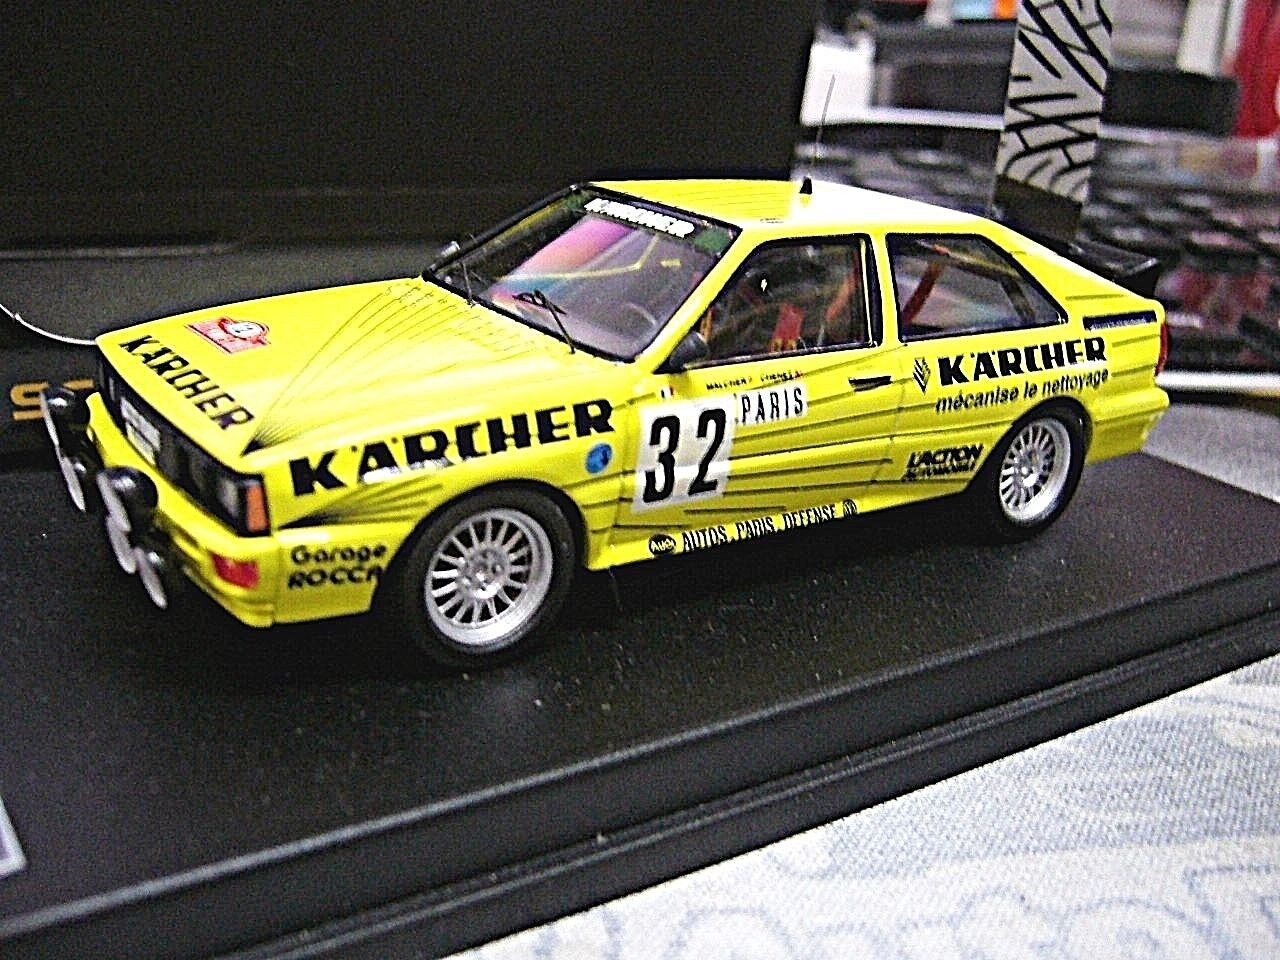 Audi Quattro Rallye WM Monte Carlo Karcher MALCHER MALCHER MALCHER  32 Chen 1 250 SCALA 43 1 43 f88527